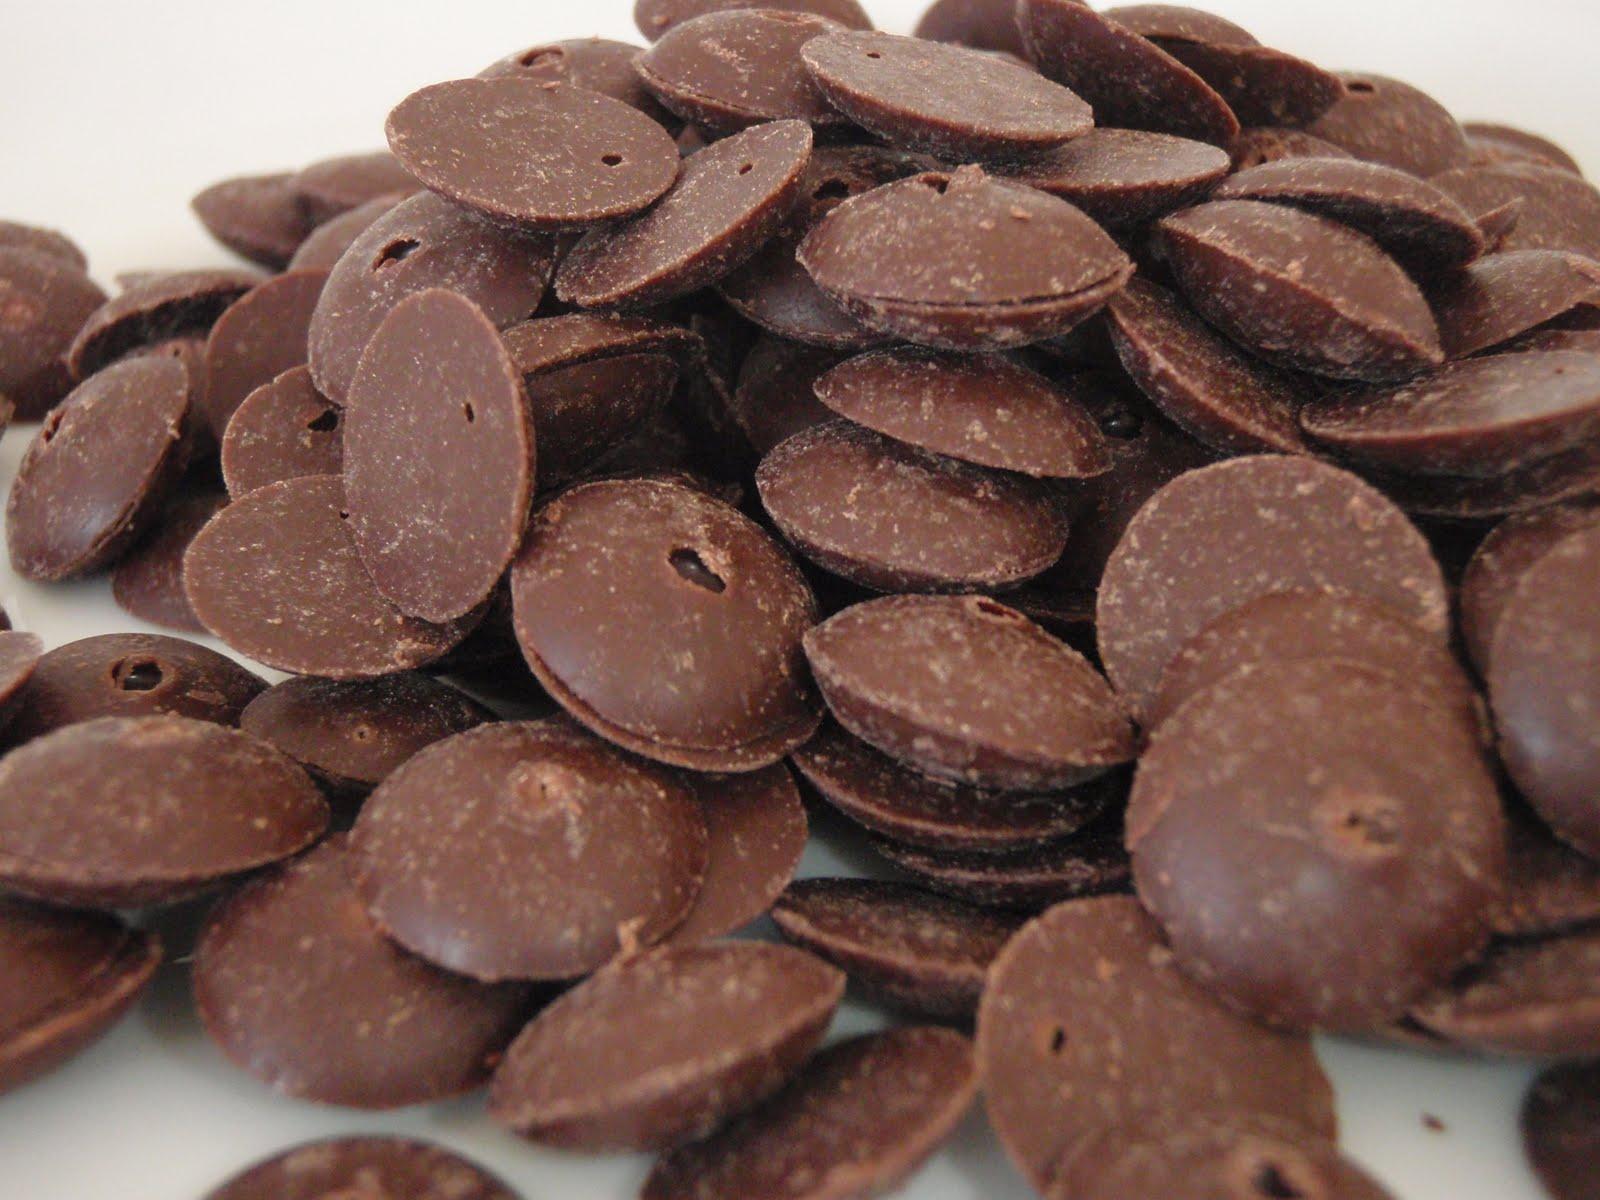 chokolade til boller